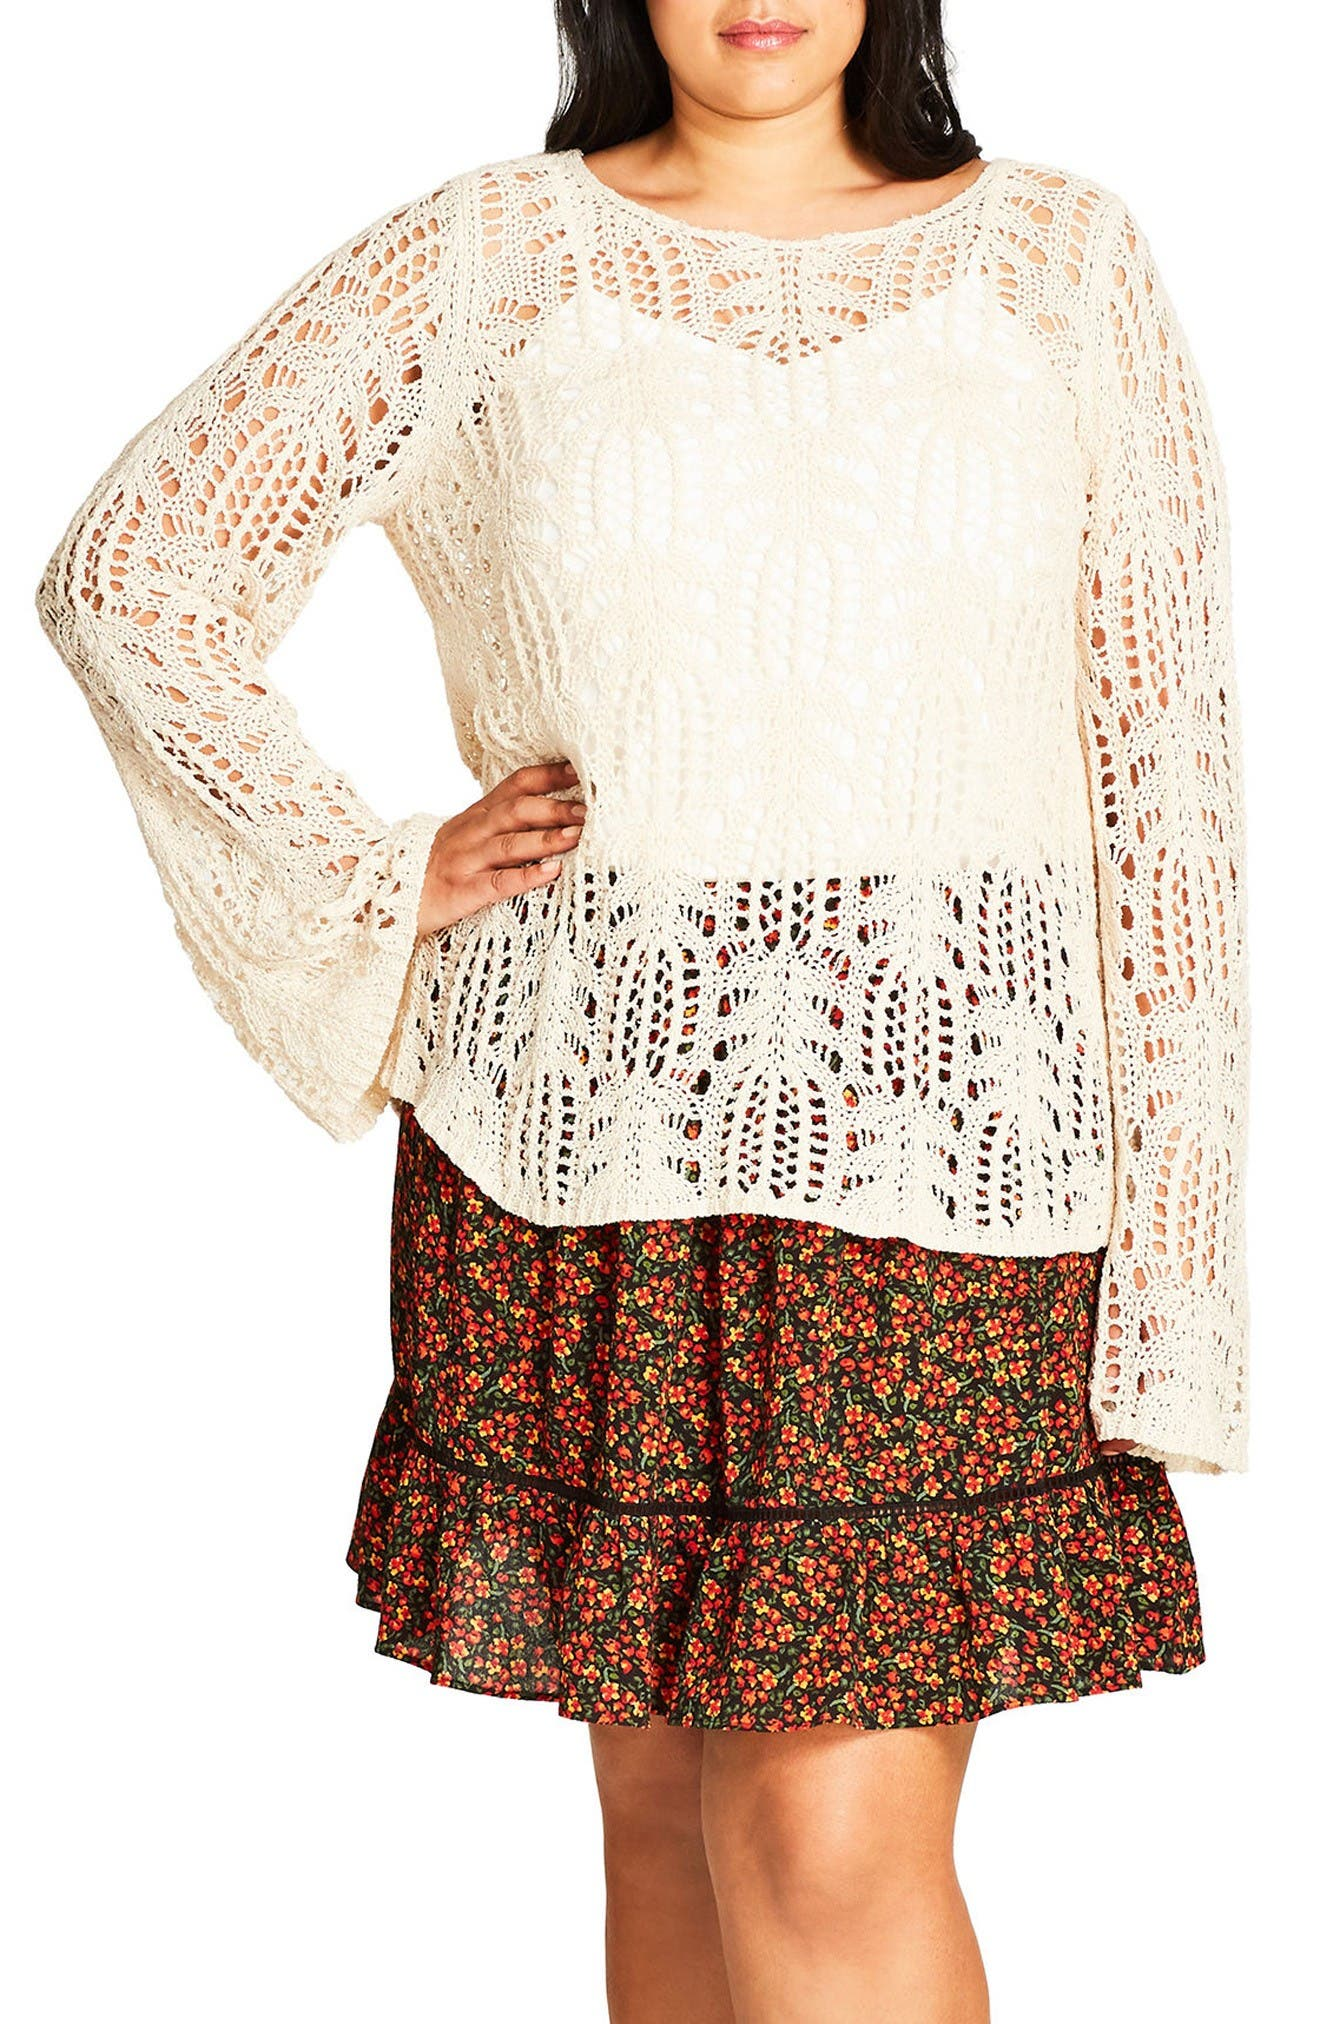 City Chic So Delicate Crochet Sweater (Plus Size)